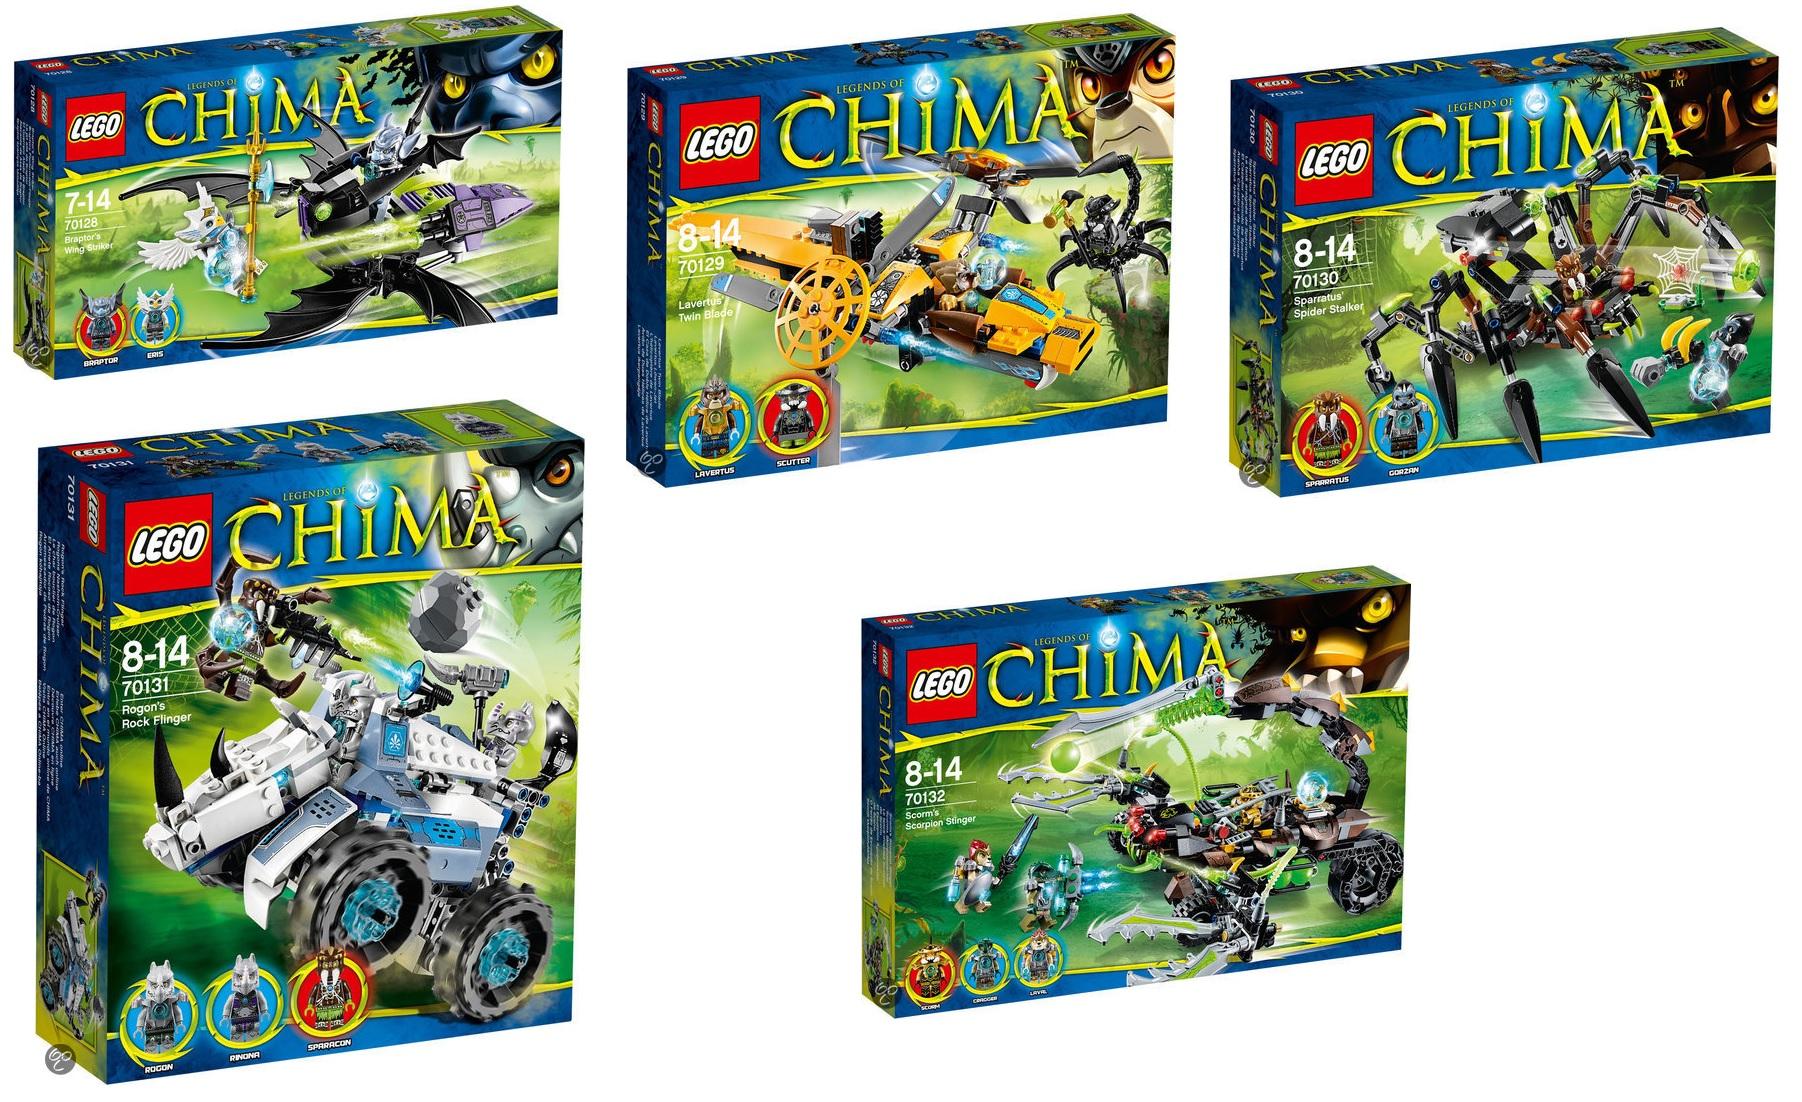 LEGENDS OF CHIMA! - Página 2 2014-LEGO-Legends-of-Chima-Sets-70128-70129-70130-70131-70132